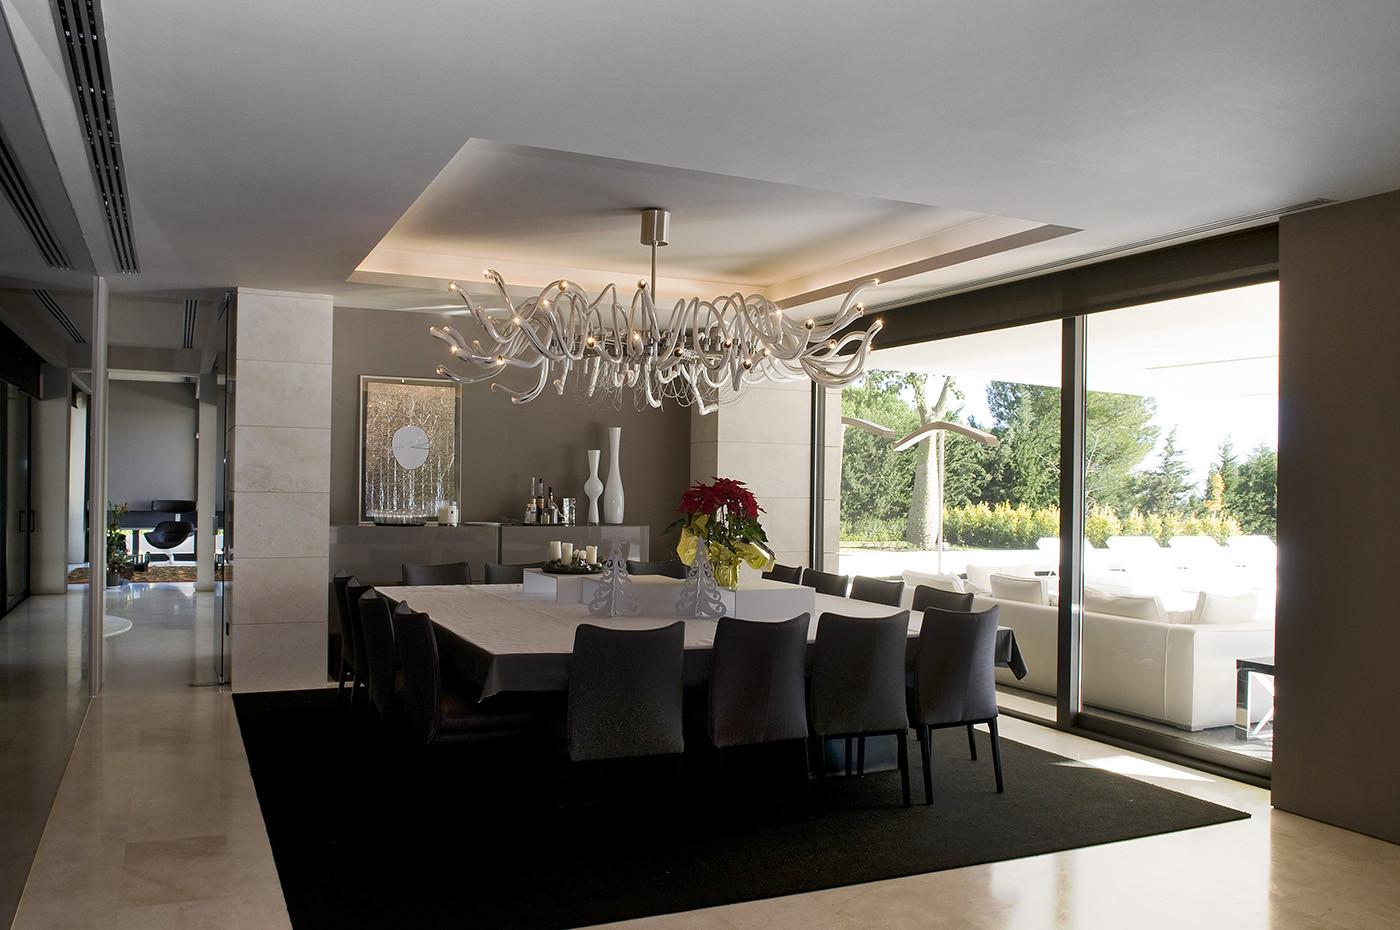 Gallery Of Single Family Property In Marbella A Cero 36